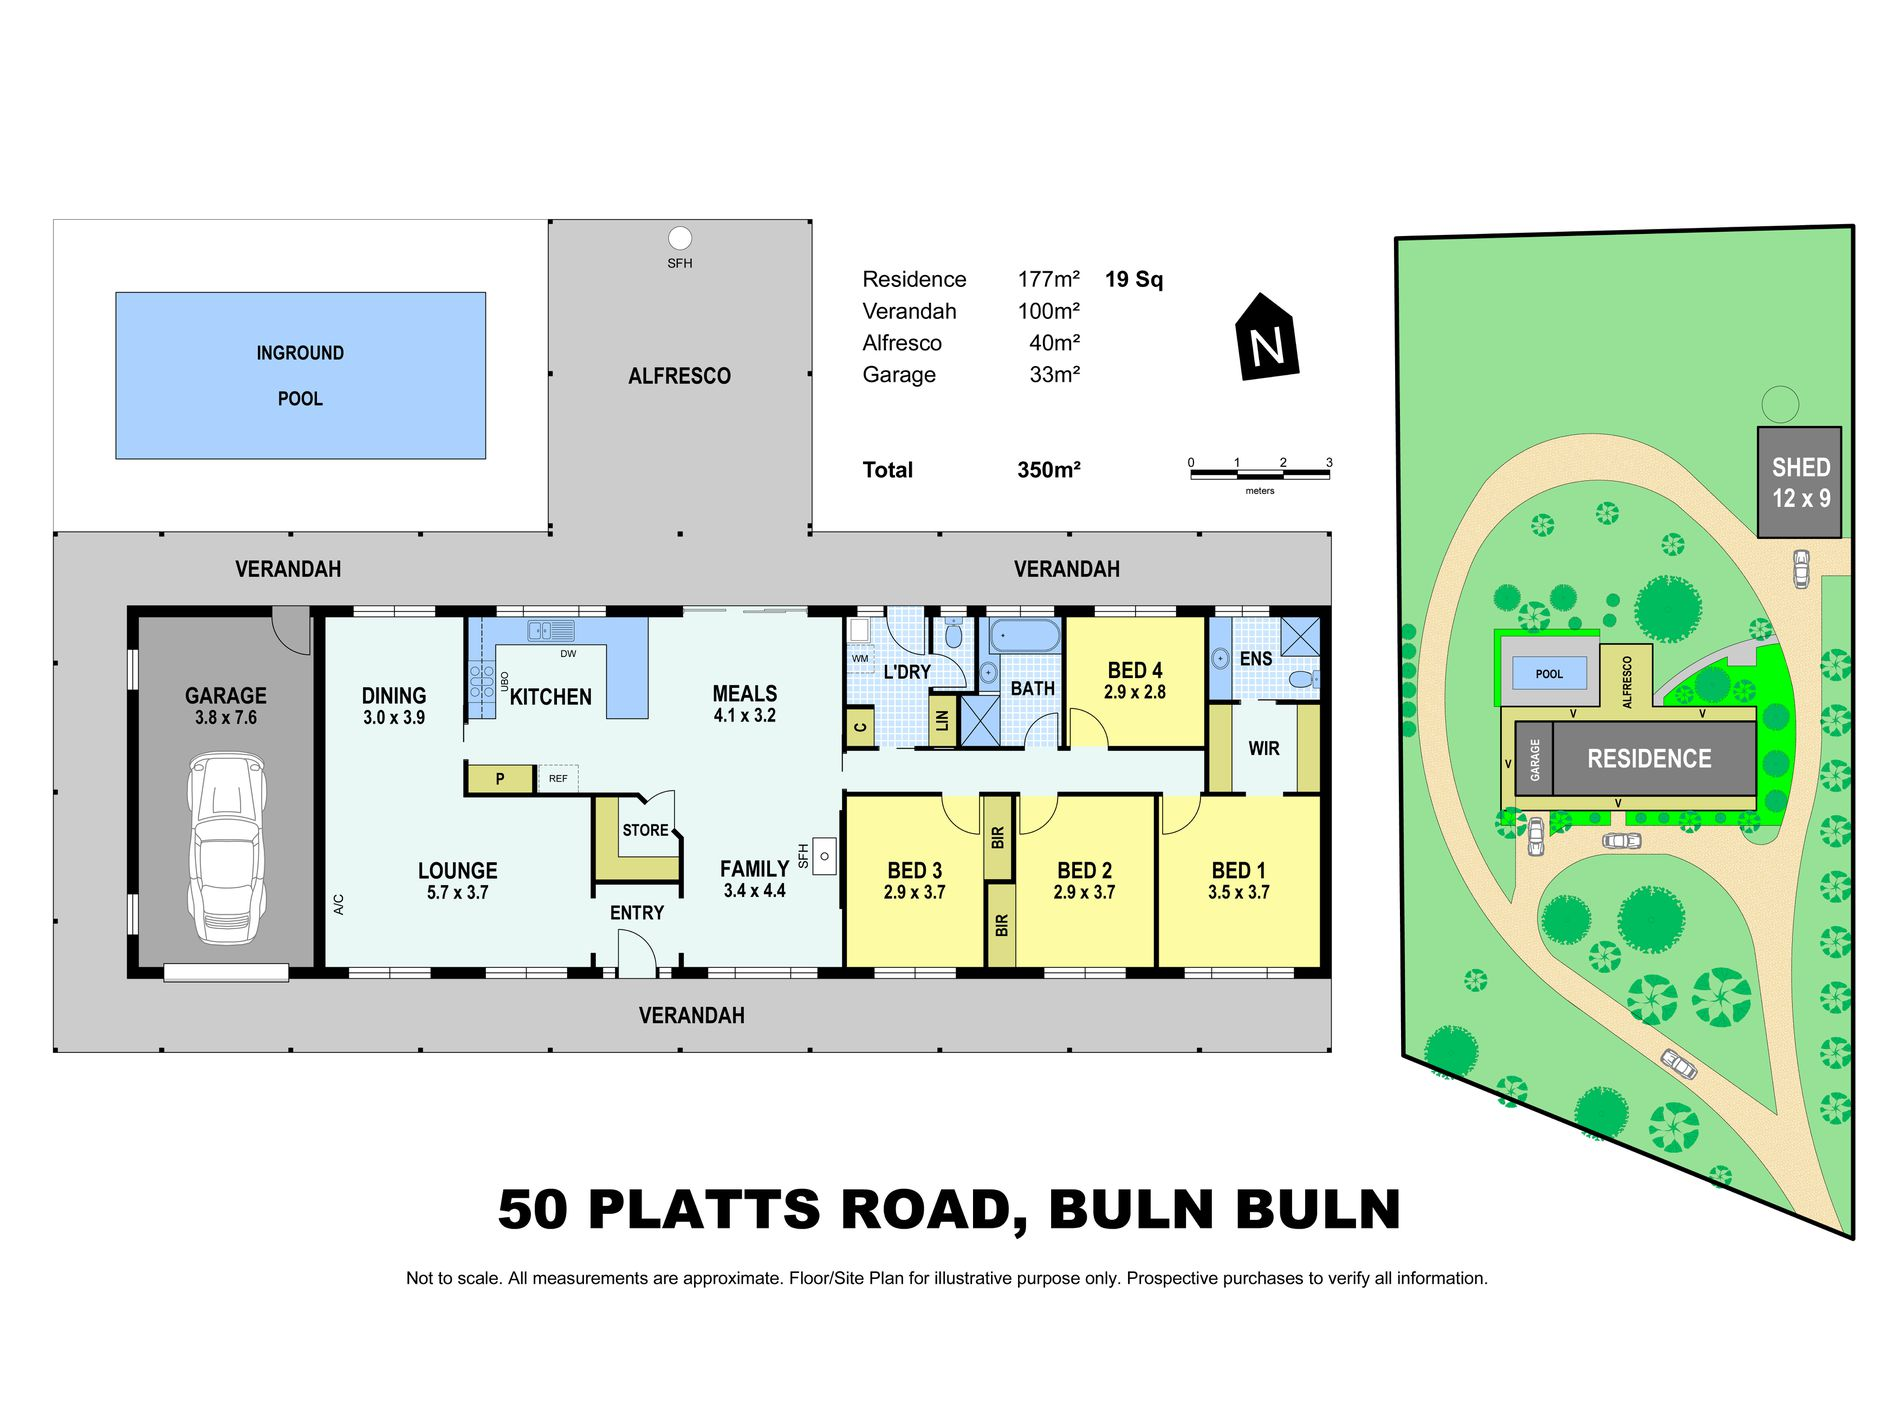 50 Platts Road, Buln Buln